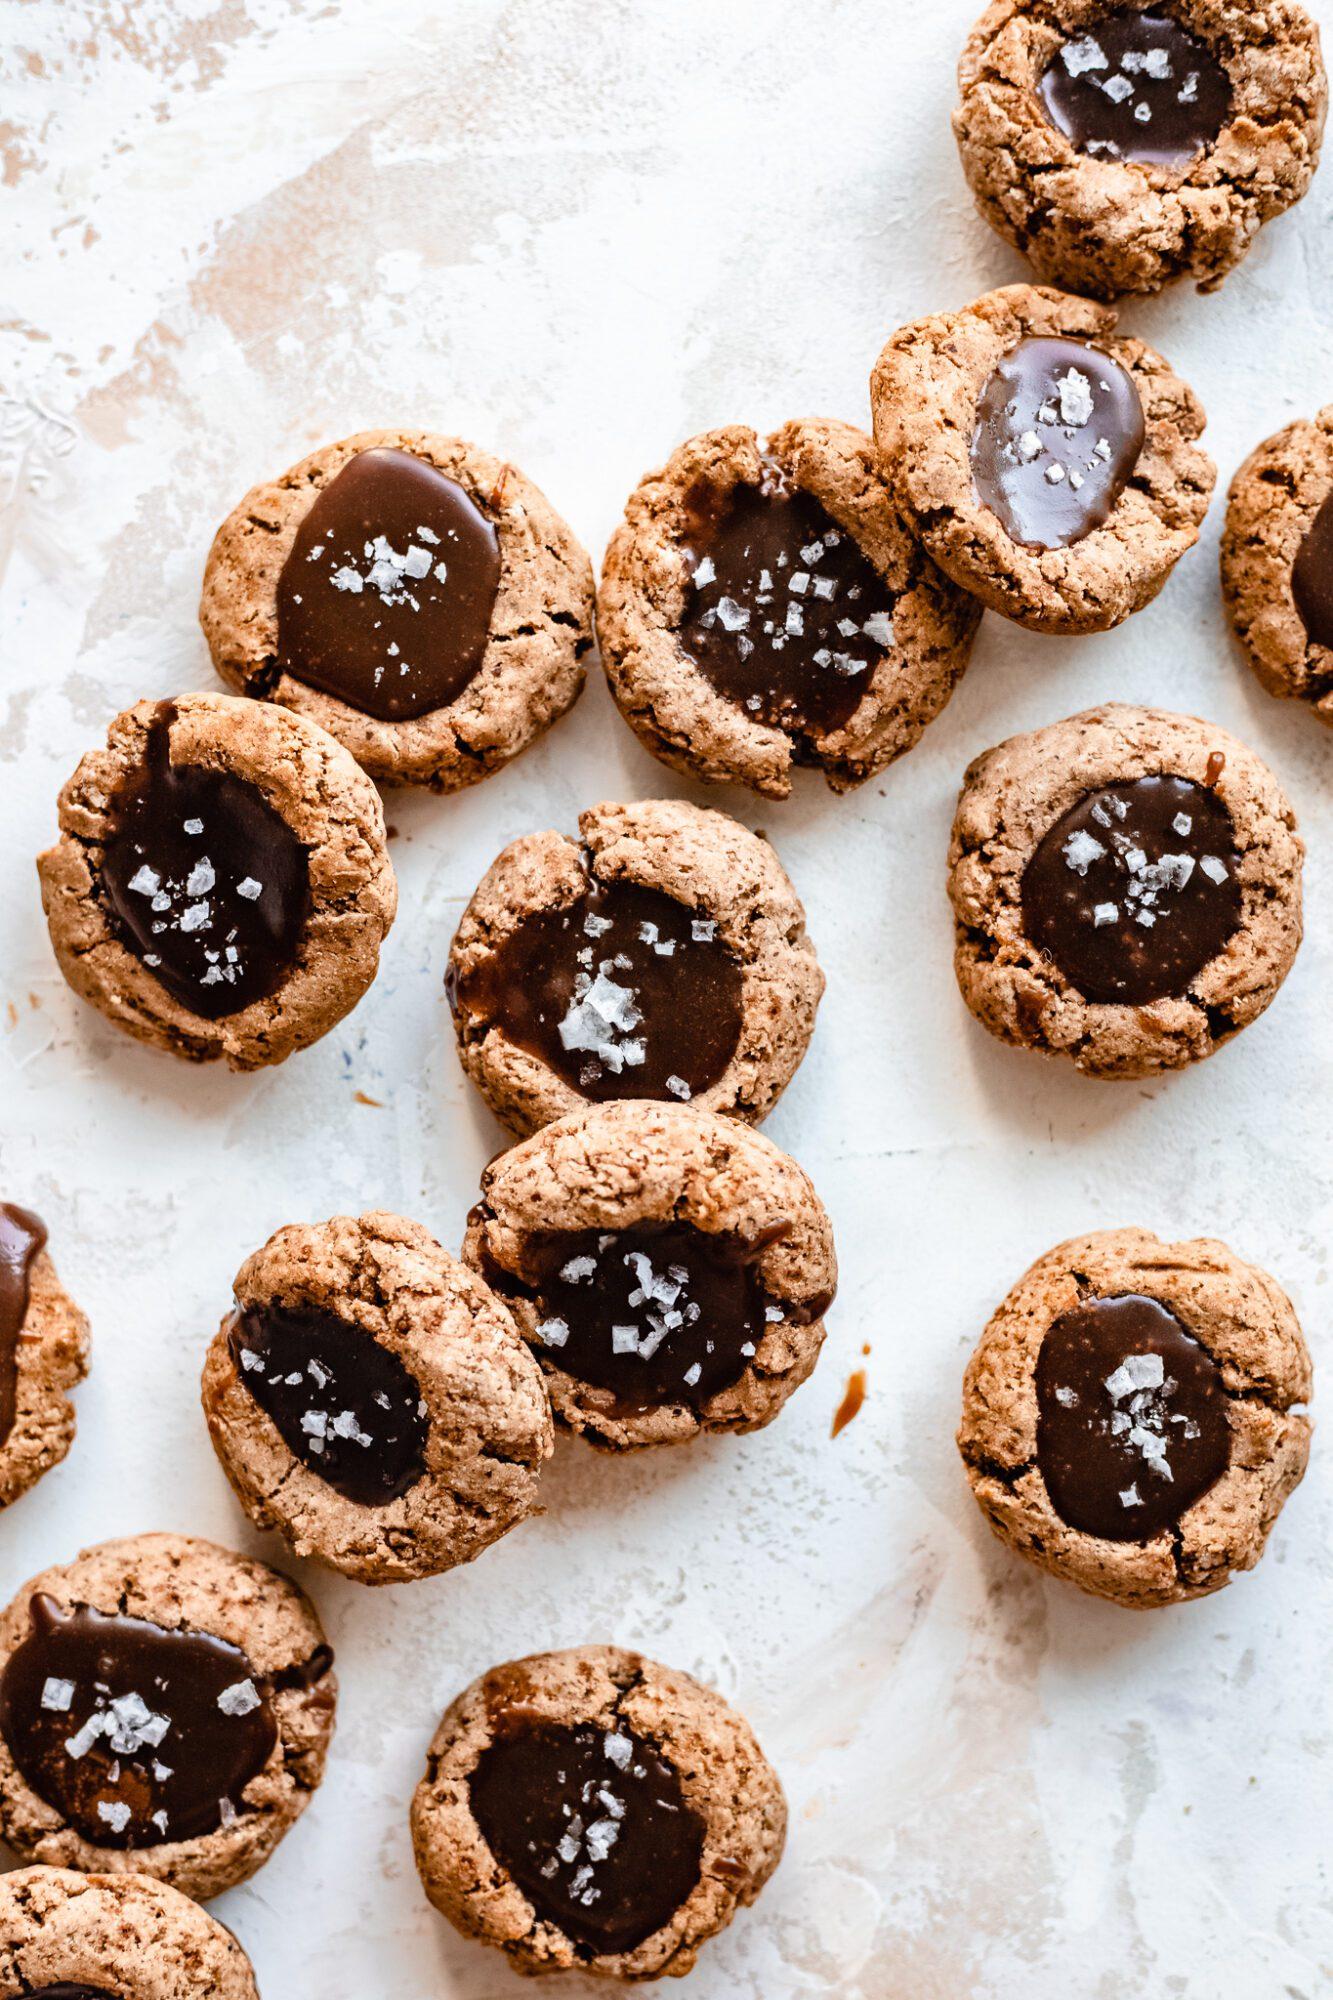 stacks of vegan caramel cookies with sea salt on top